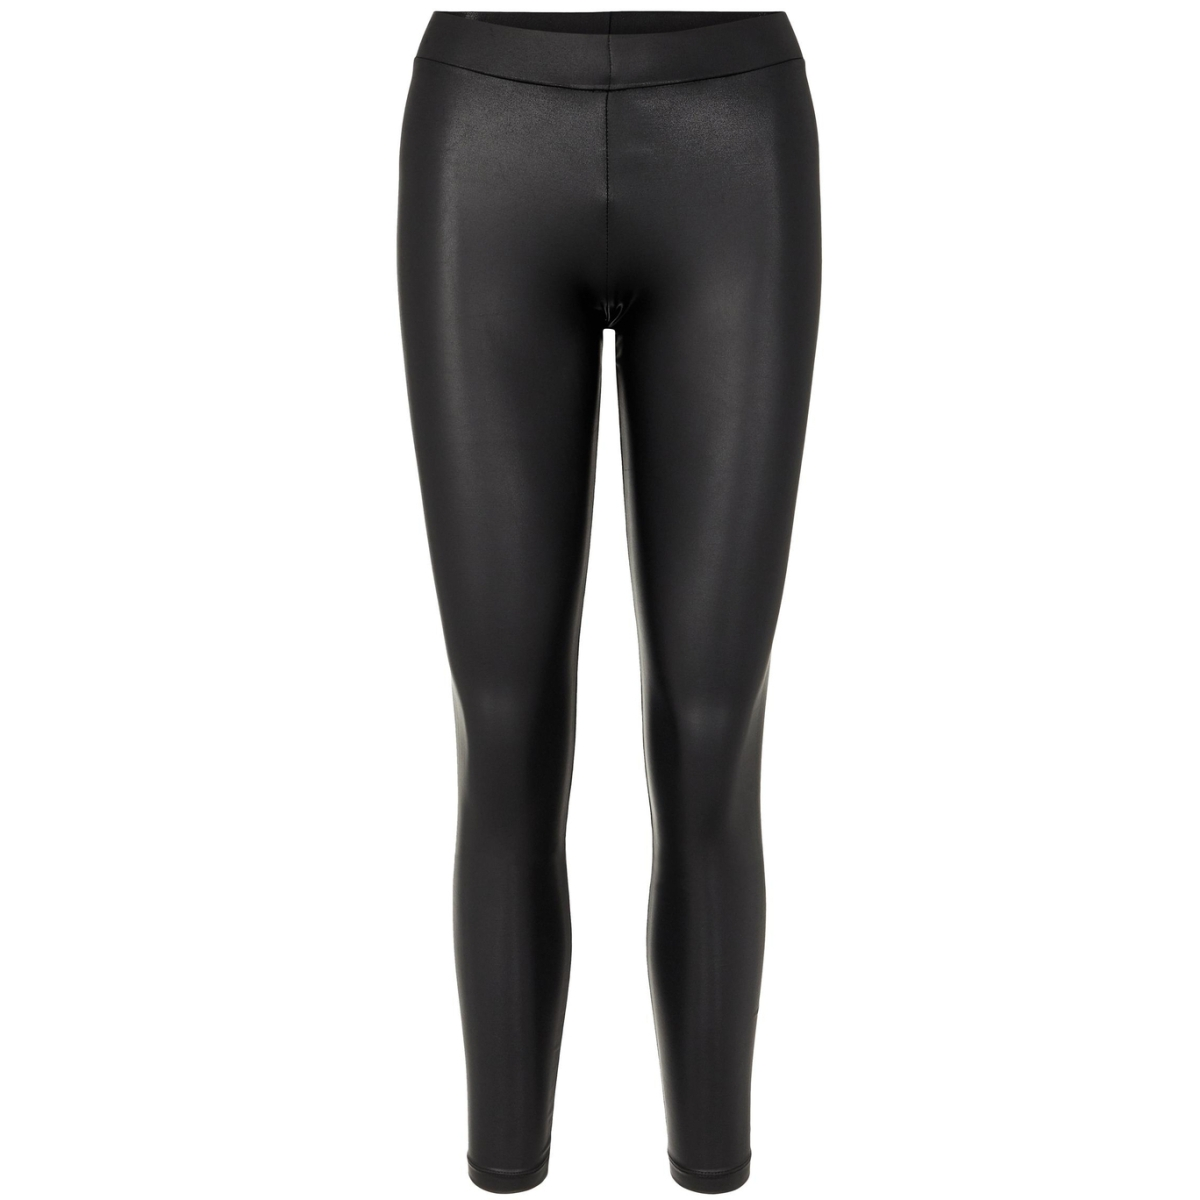 new shiny leggings 17058457 pieces legging black